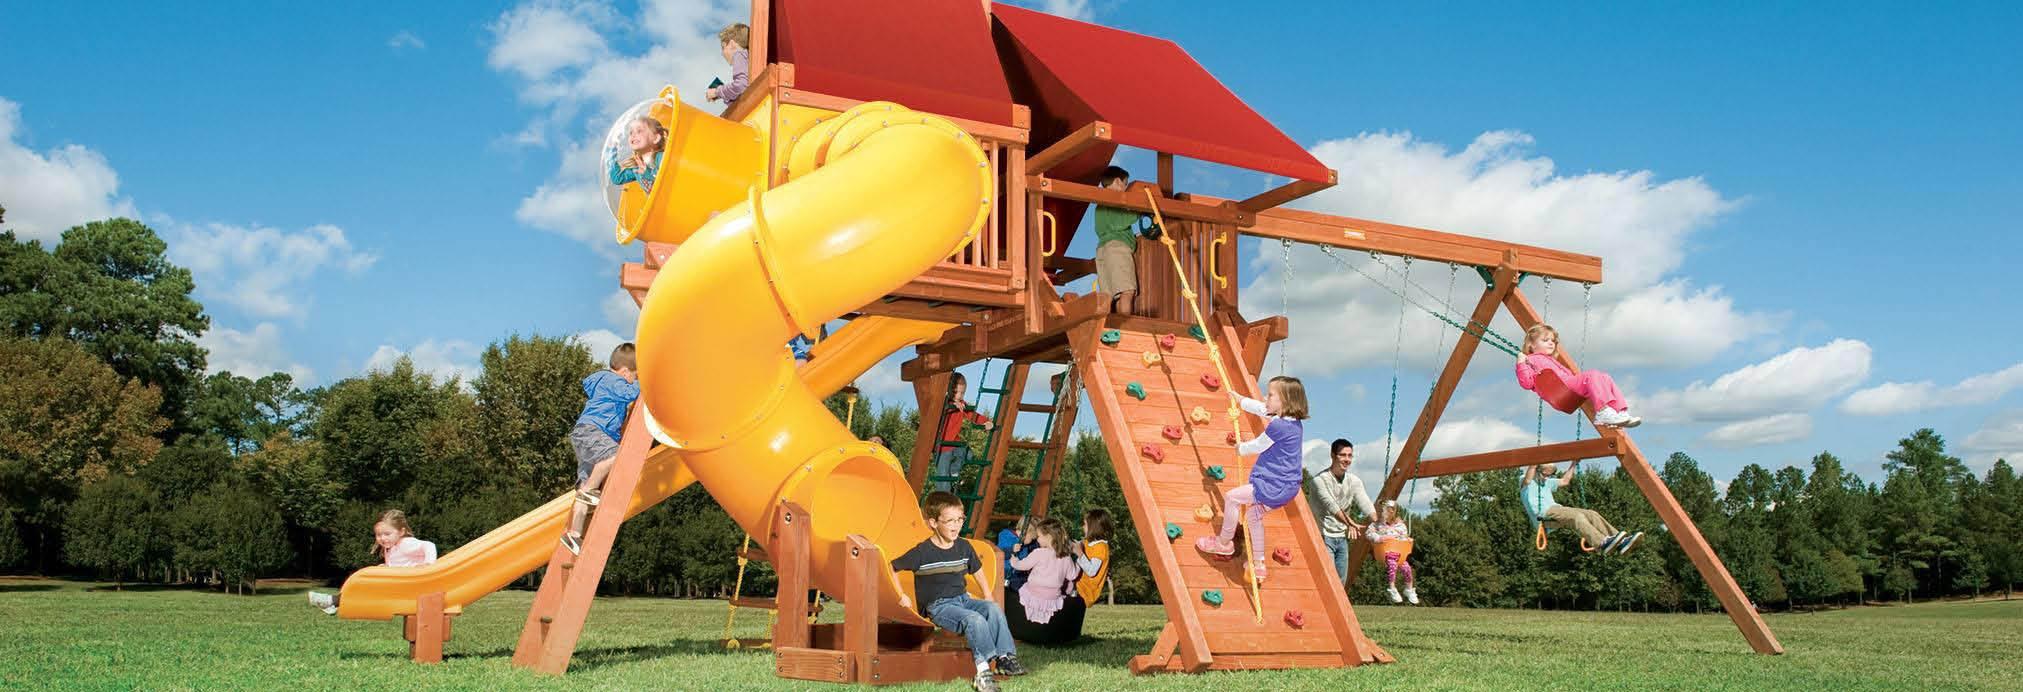 Puget Sound Playgrounds main banner image - Fife, WA